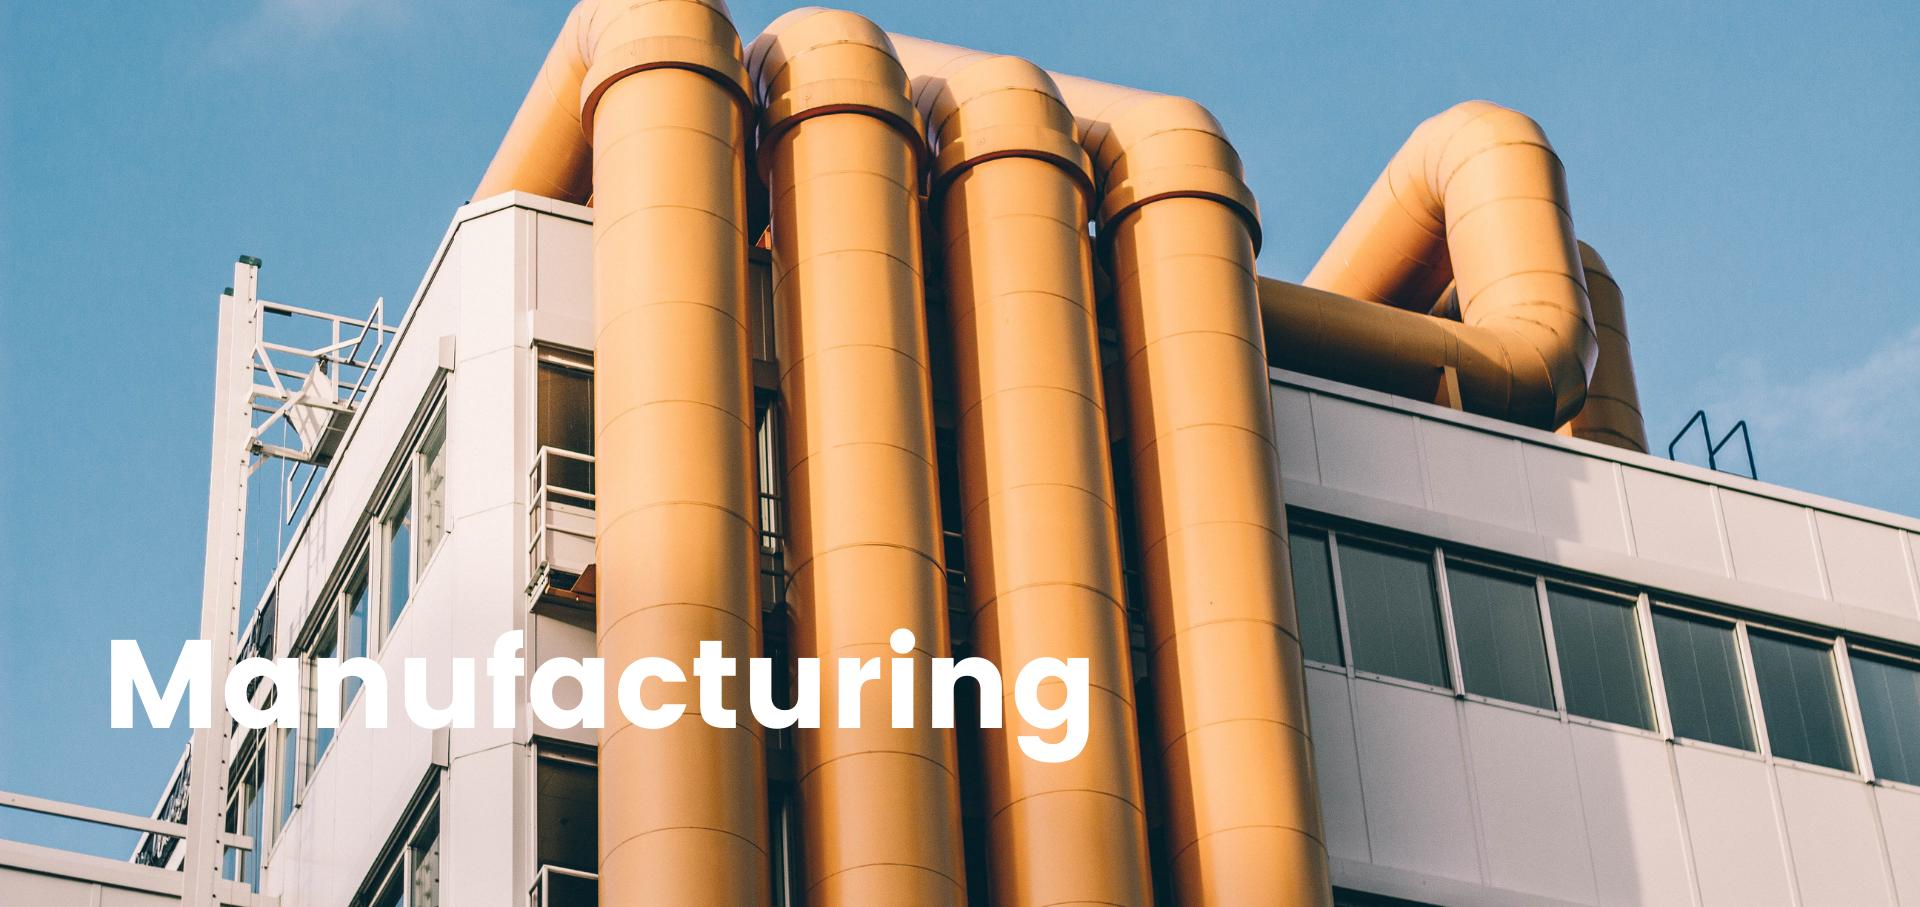 manufacturing case studies engsolve renewable engineering consultancy